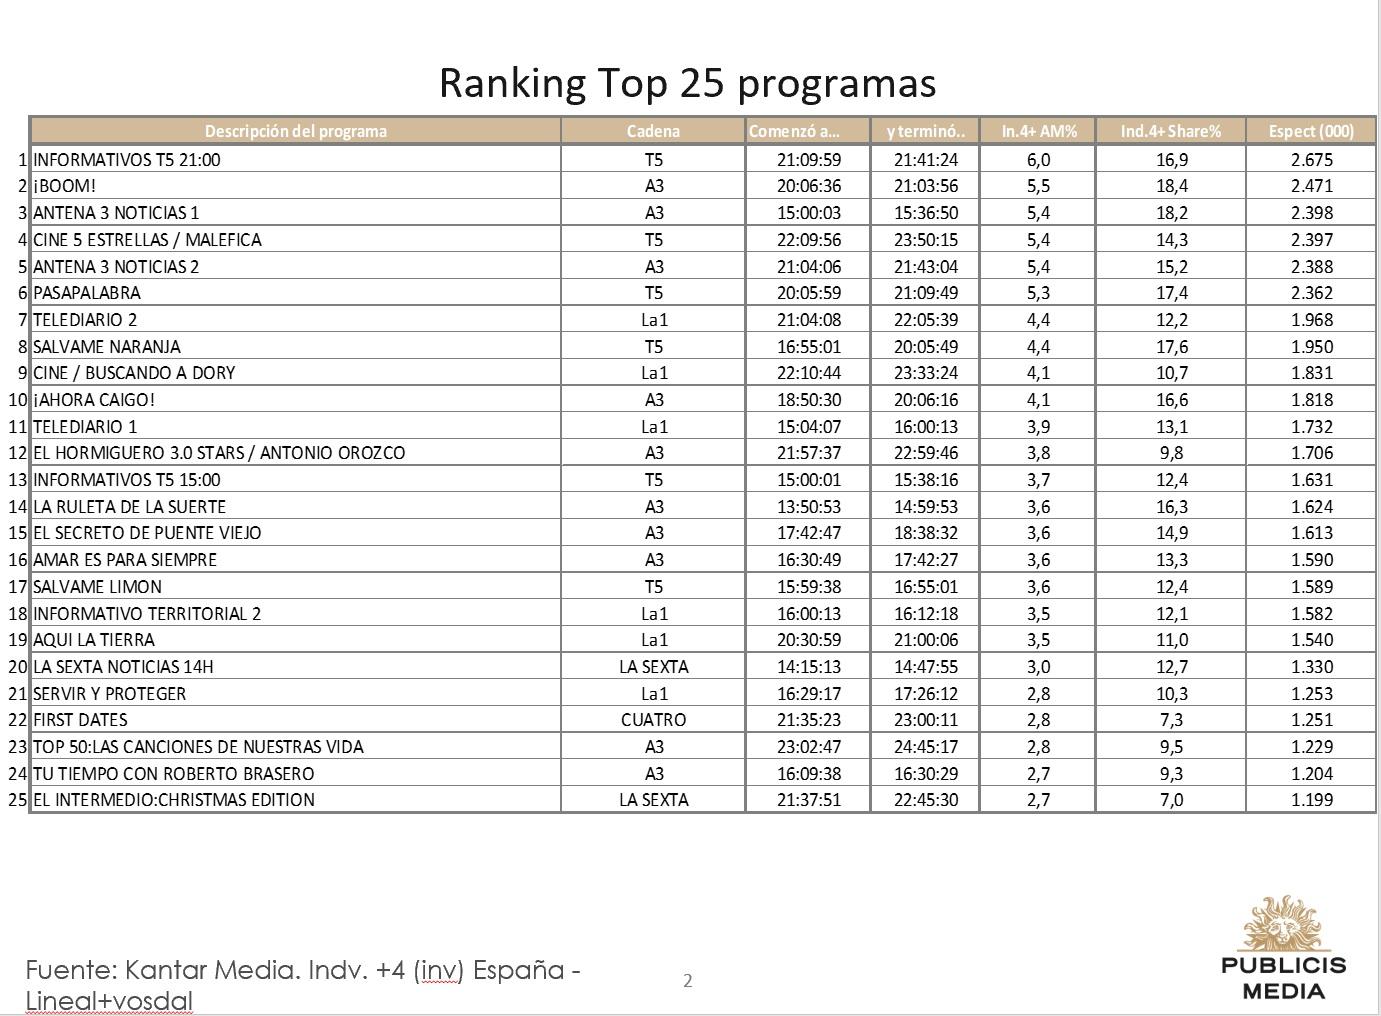 https://www.programapublicidad.com/wp-content/uploads/2018/12/Top-25-Publicis-media-27-dic-2018-programapublicidad-muy-grande.jpg